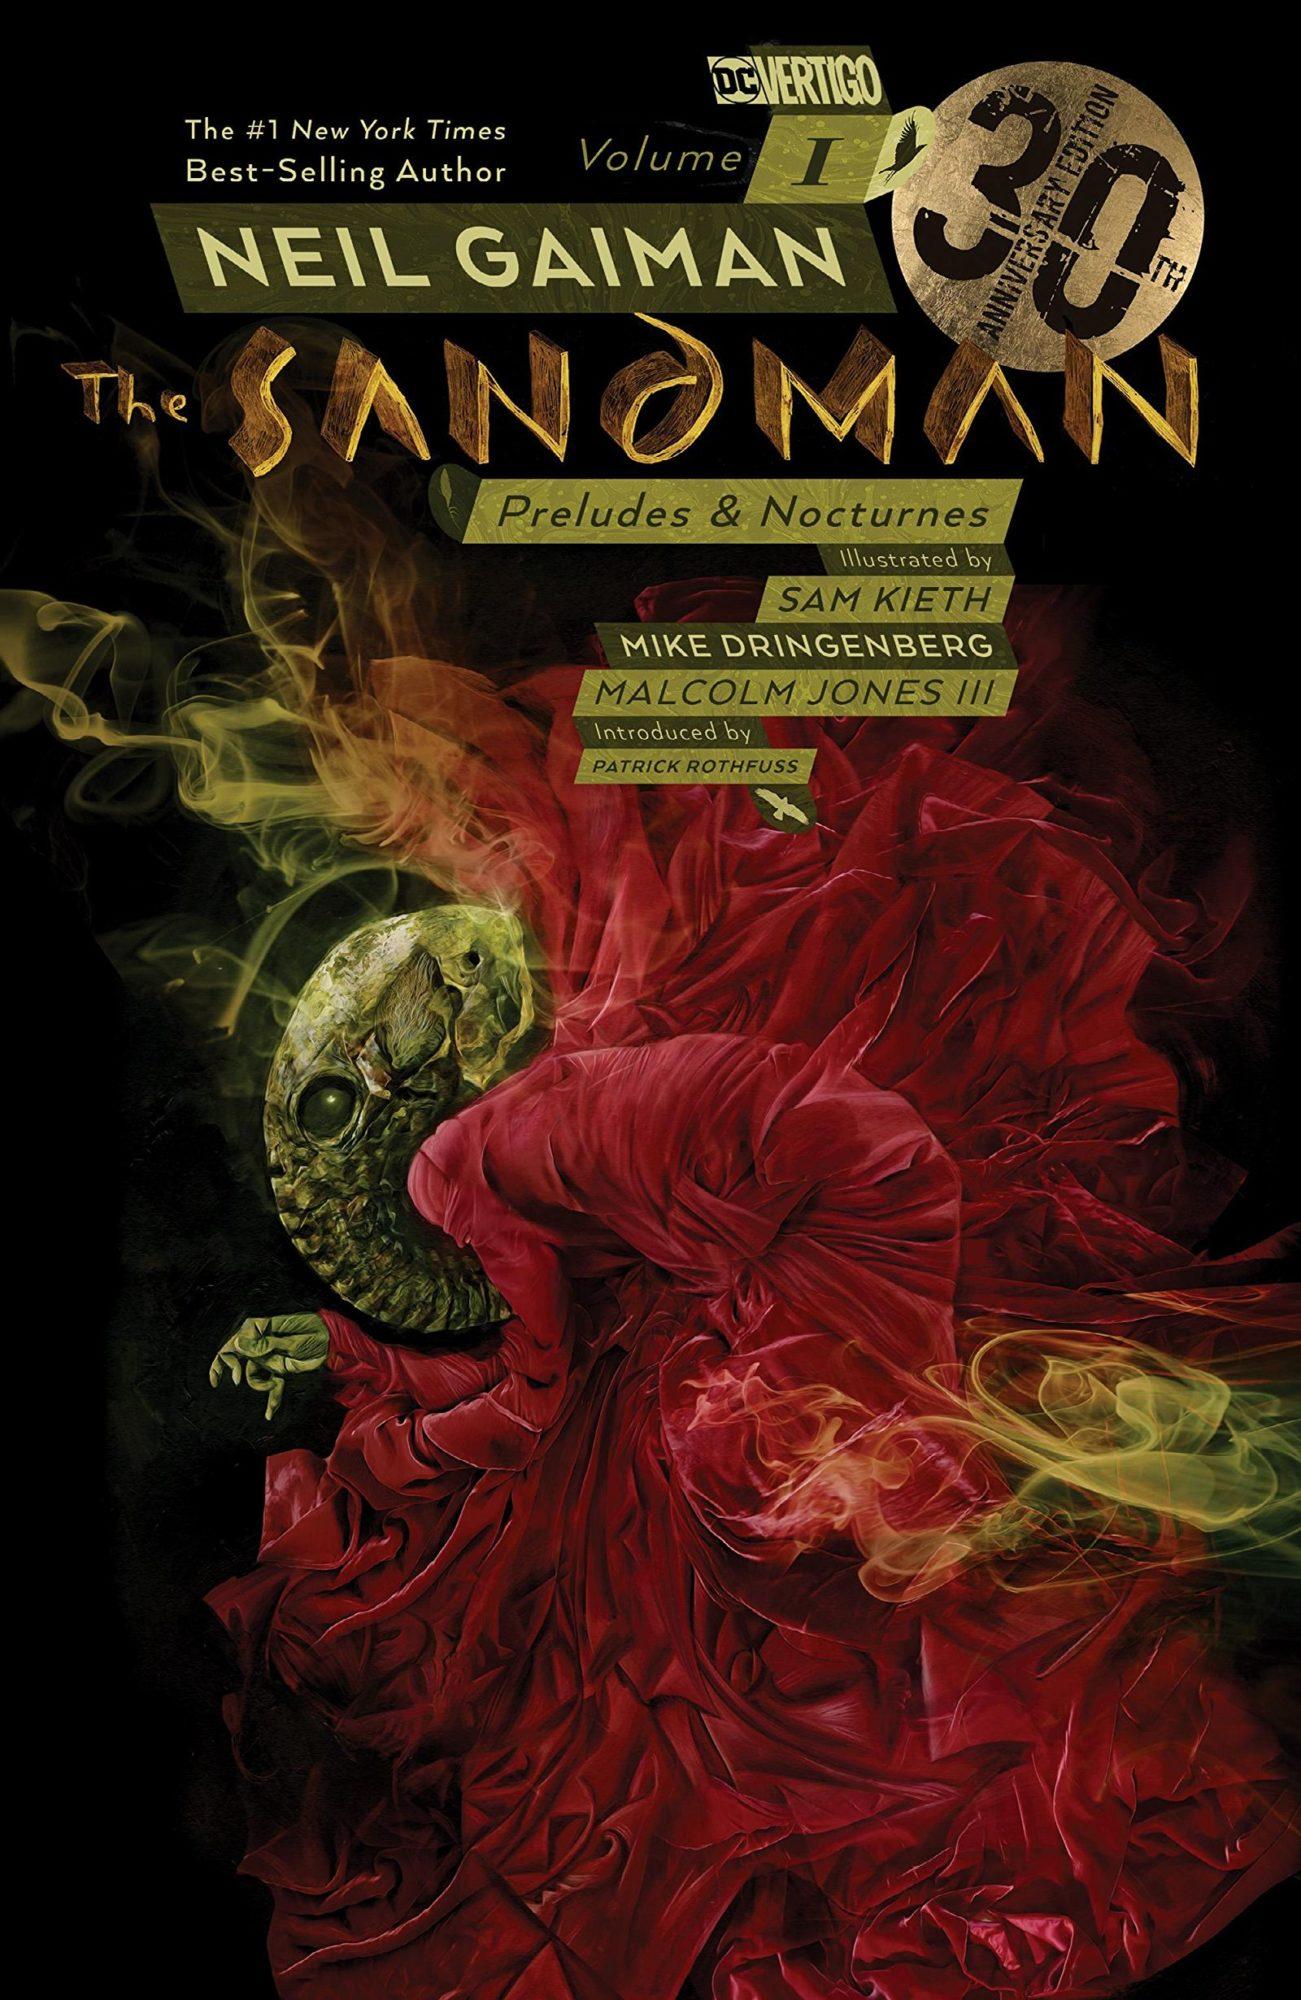 Neil Gaiman's The Sandman Preludes & Nocturnes cover